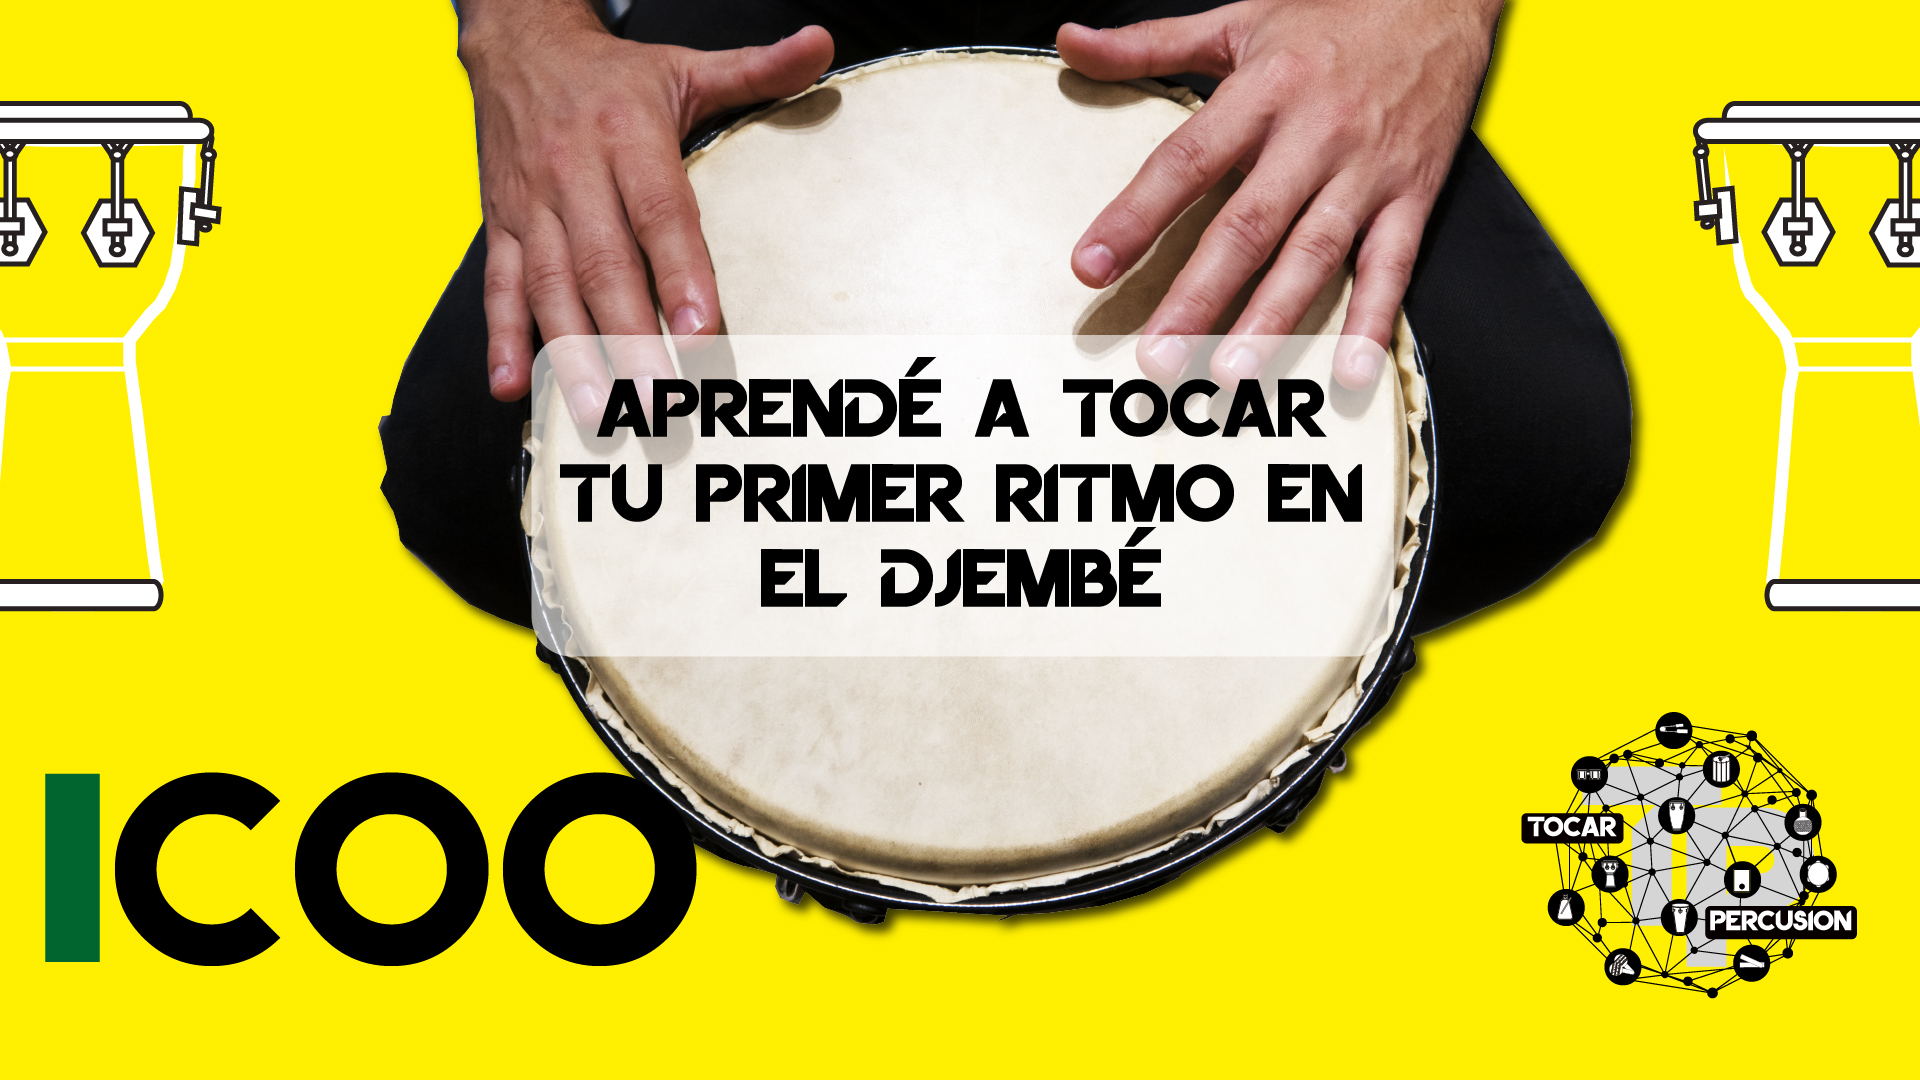 Tocar-Cursos-Online-de-Percusion-Djembe